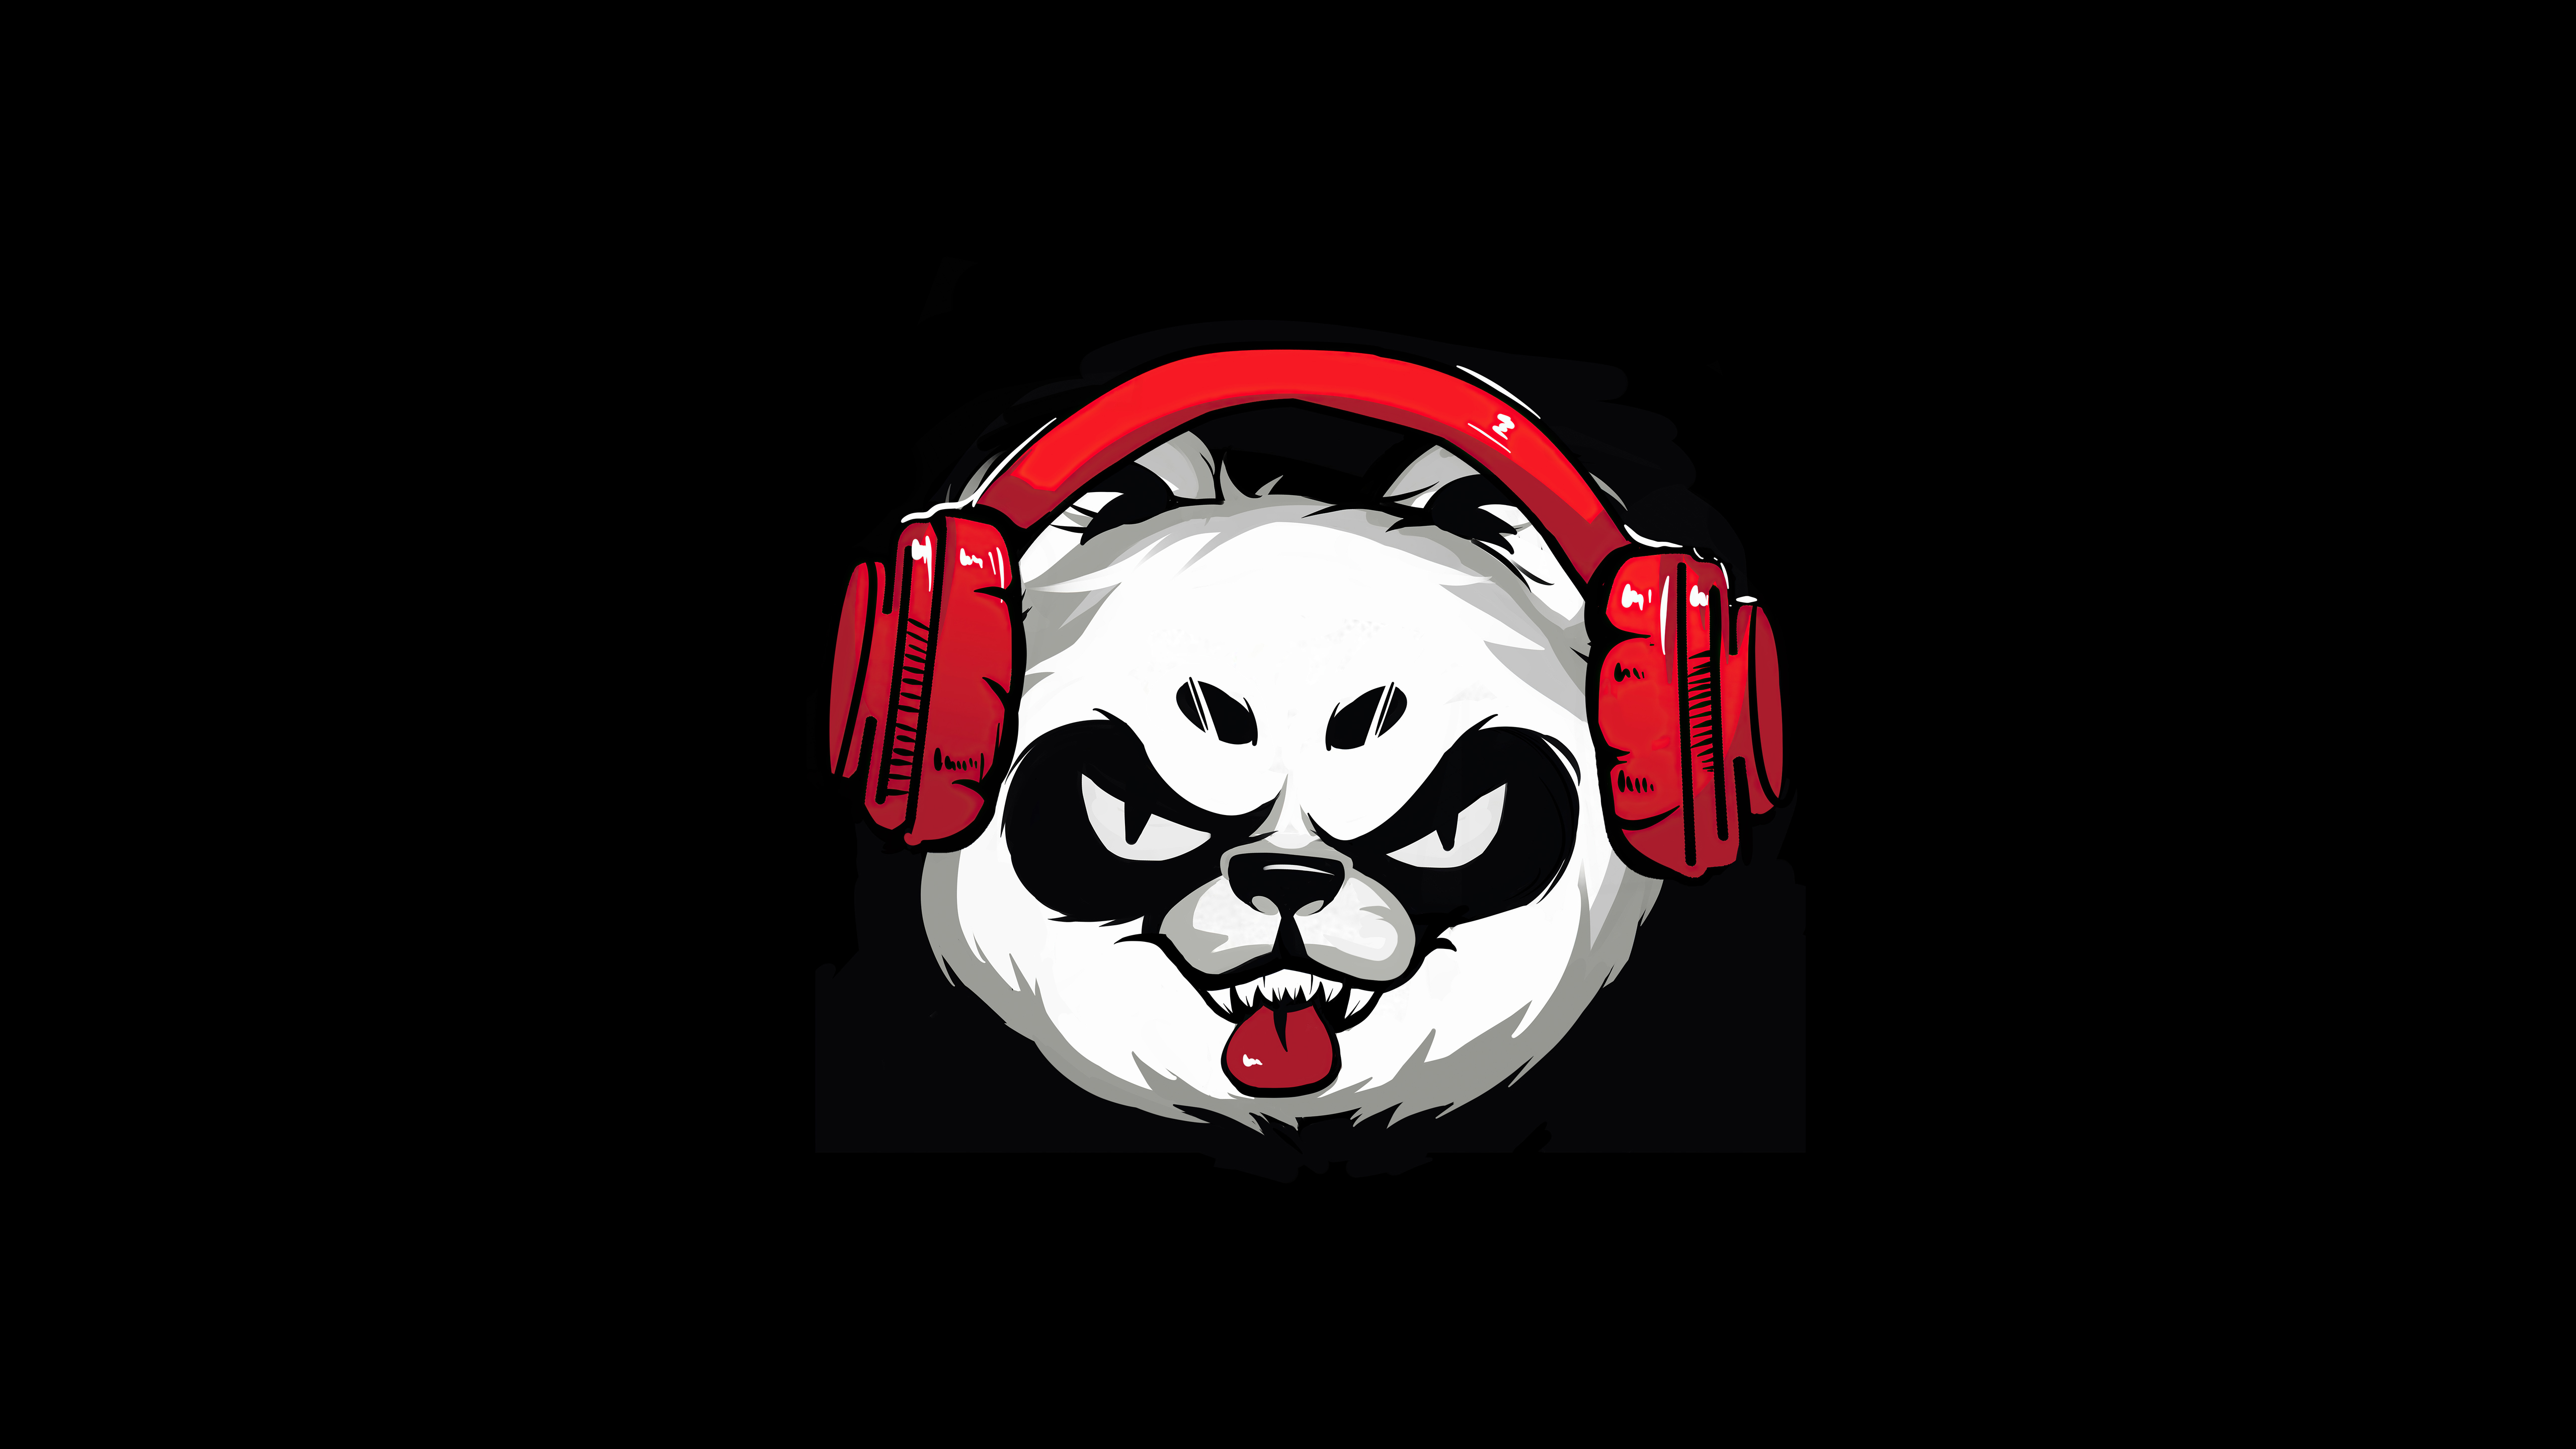 naughty panda minimal 4k 1618132912 - Naughty Panda Minimal 4k - Naughty Panda Minimal 4k wallpapers